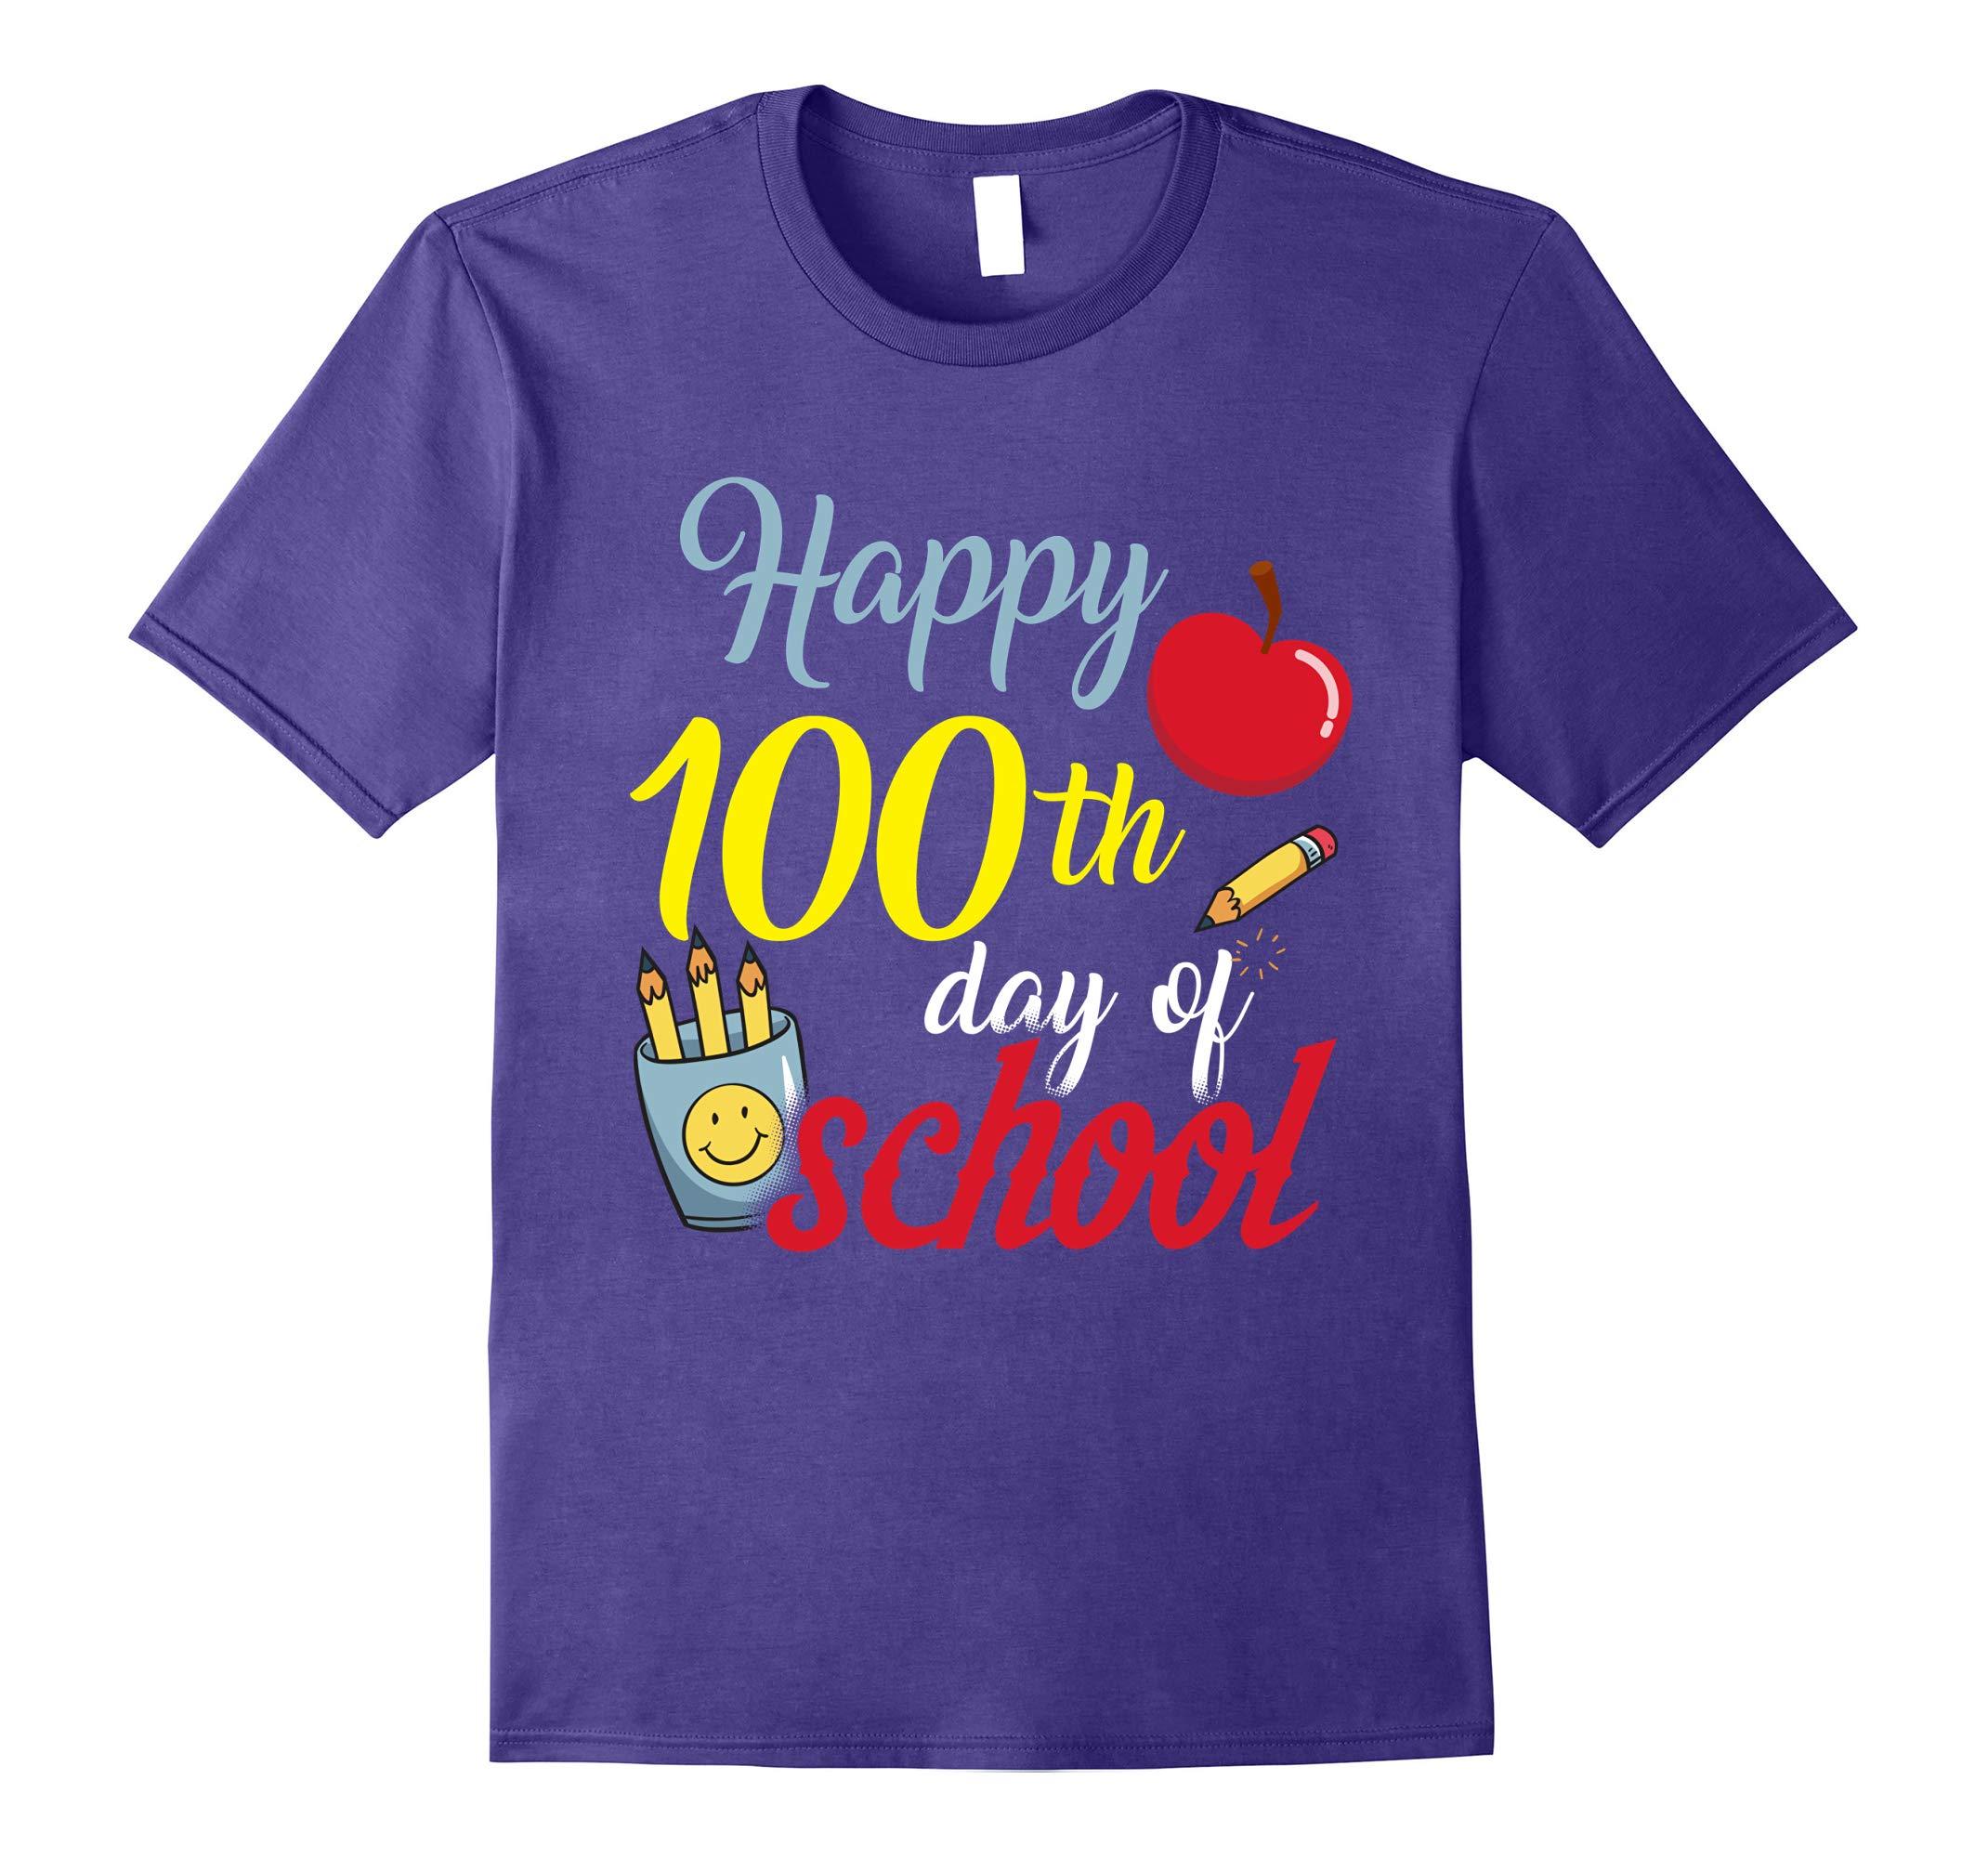 Happy 100th day of school t shirt-RT